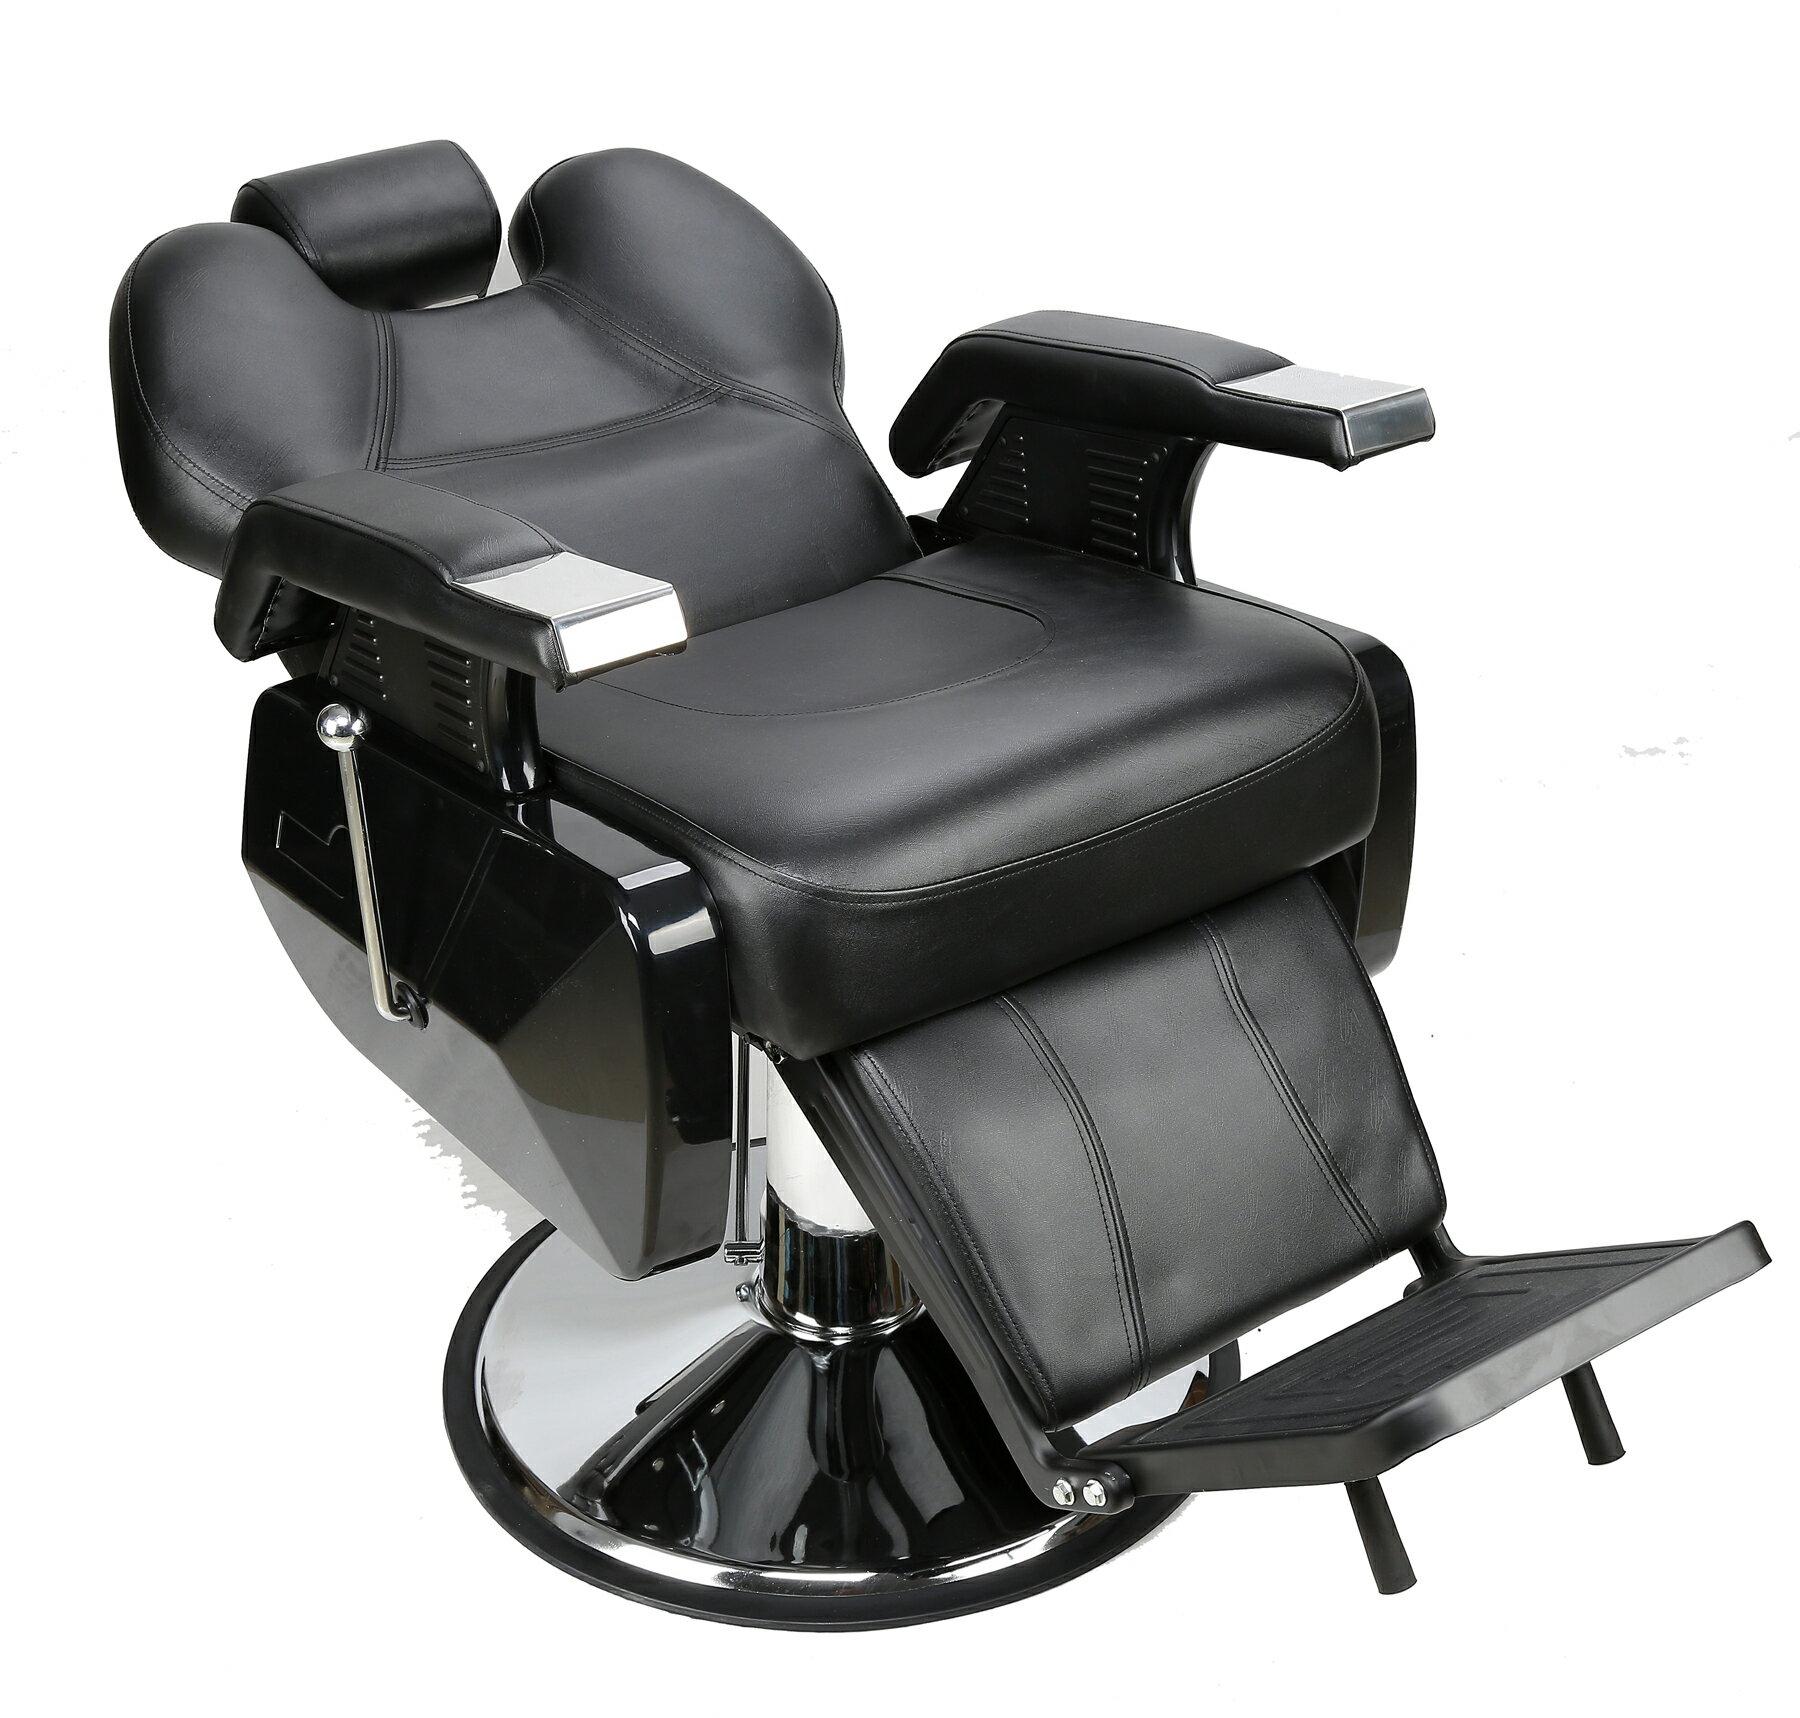 Cool Barberpub All Purpose Hydraulic Recline Salon Beauty Spa Styling Barber Chair Black Dailytribune Chair Design For Home Dailytribuneorg